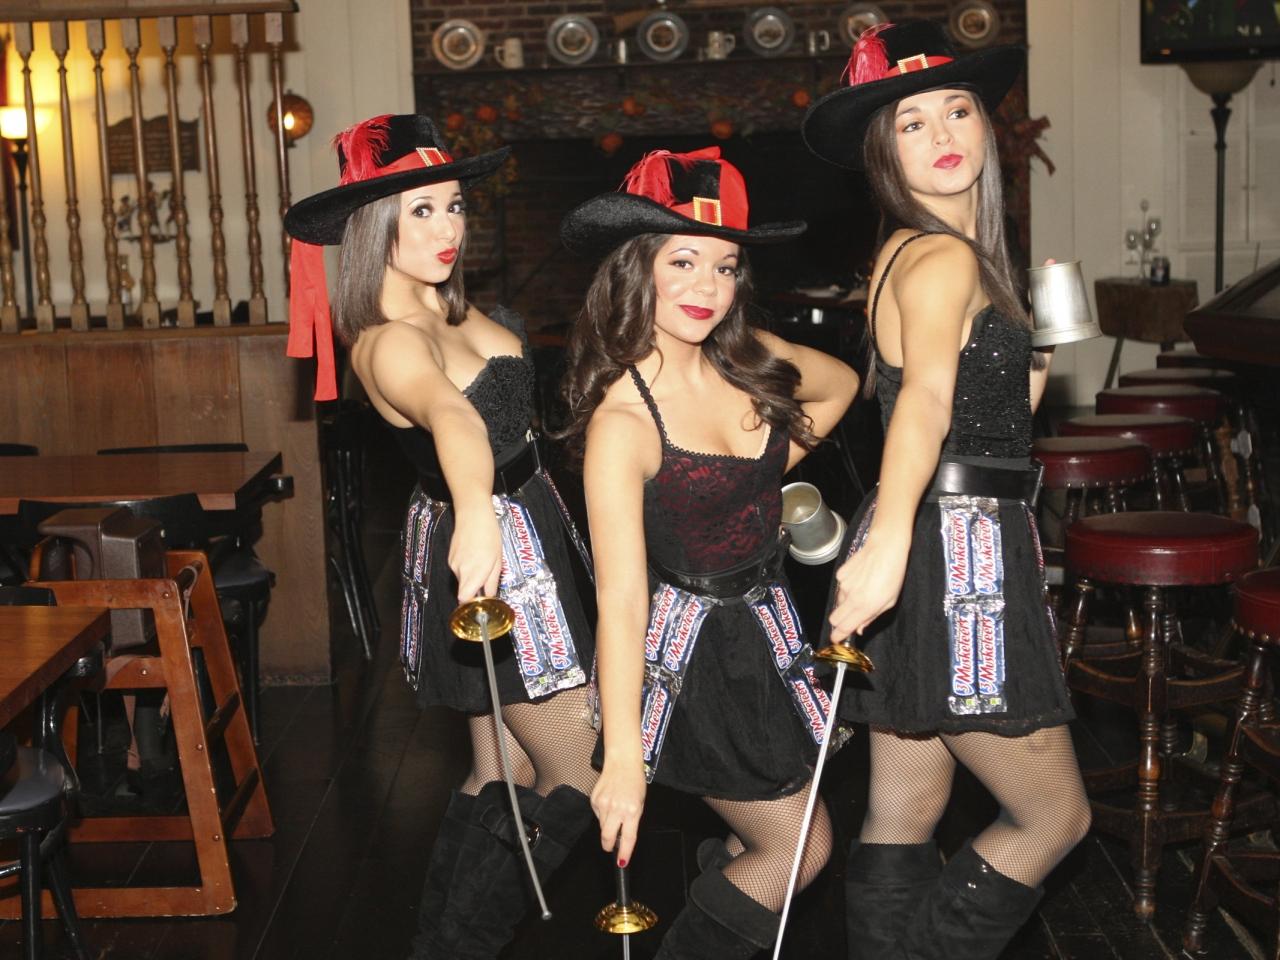 Tres Chicas mosqueteros - 1280x960